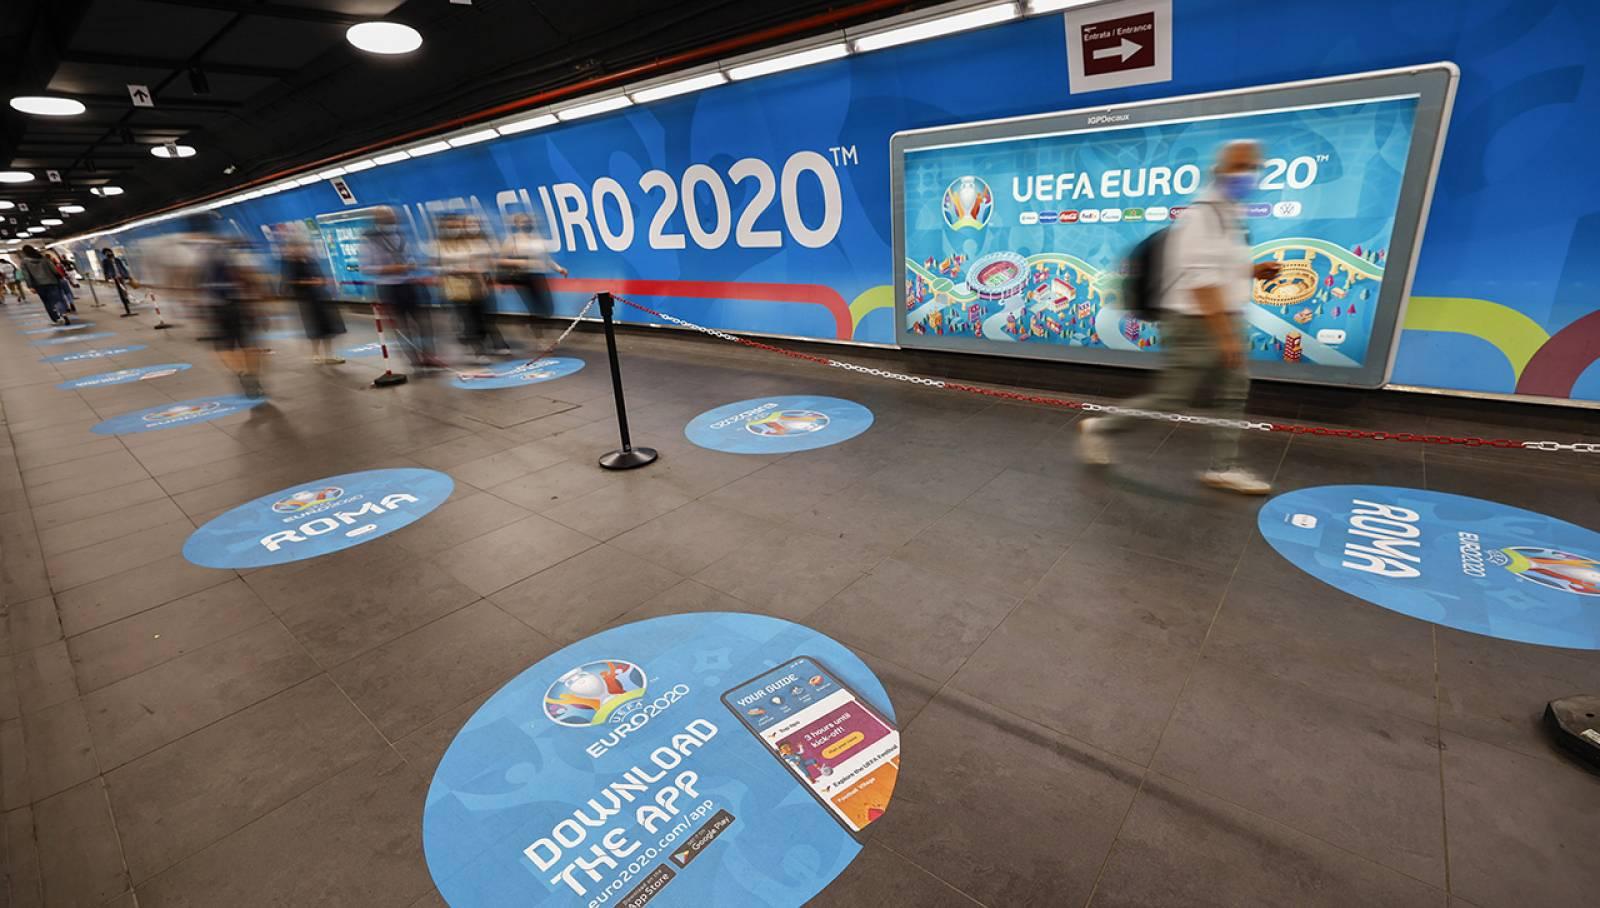 Pubblicità in metropolitana a Roma Spagna IGPDecaux Station Domination per UEFA 2020